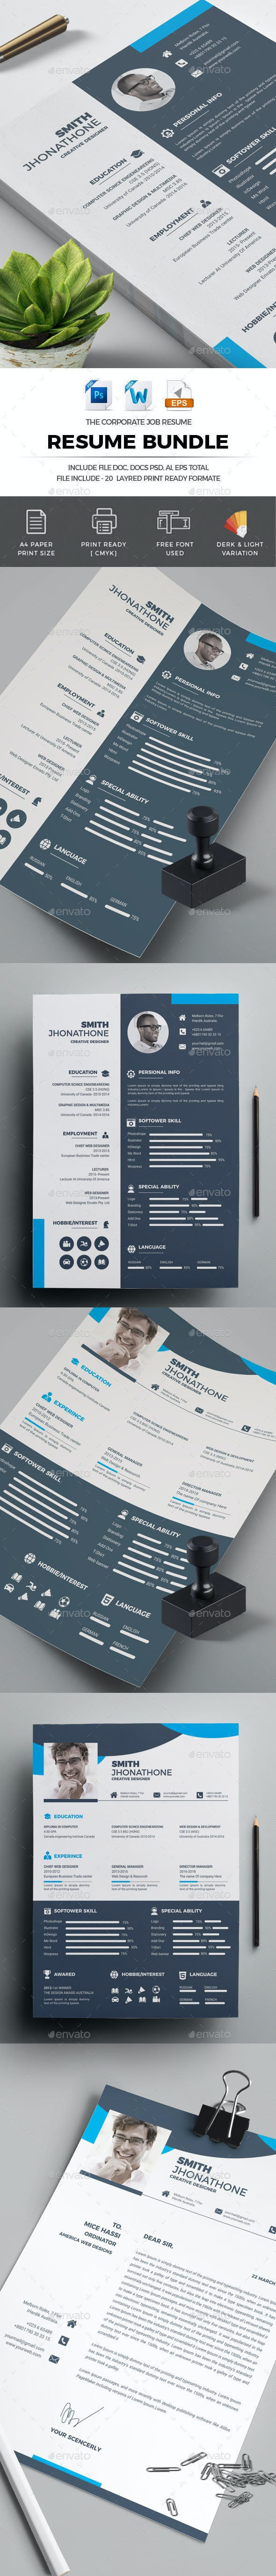 Resume CV Template Bundle - Resumes Stationery